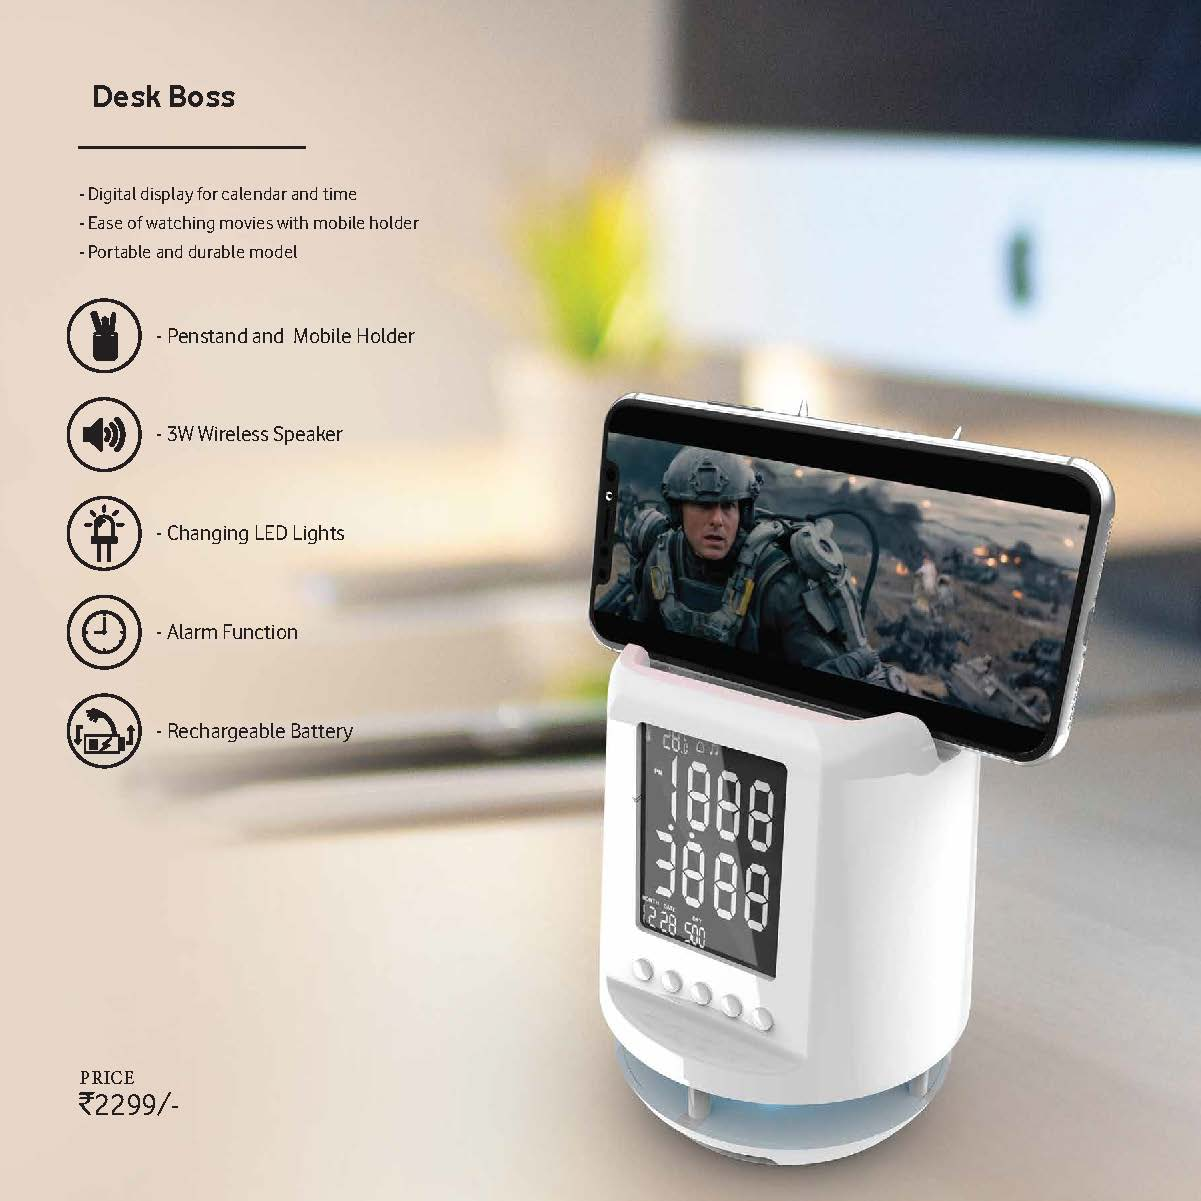 Desk Boss Bluetooth Speaker with Clock